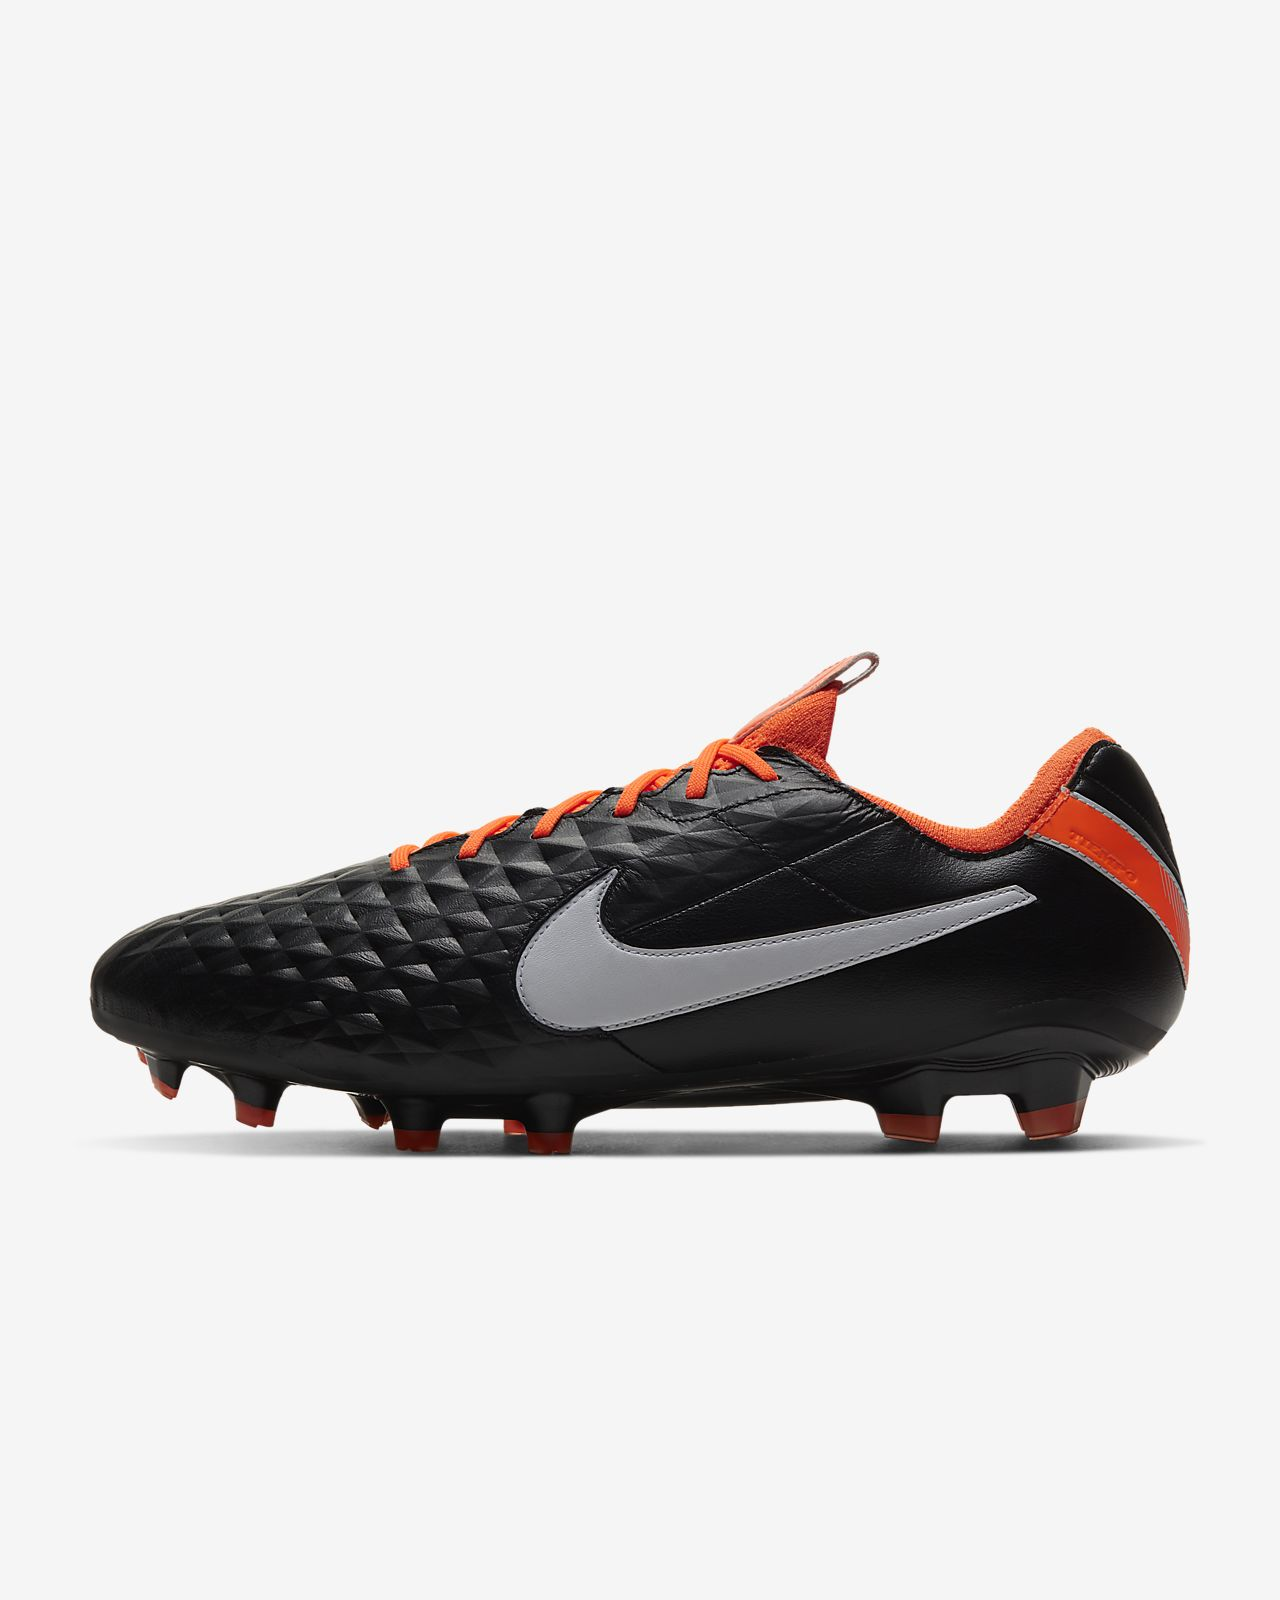 scarpe da calcio nike 2011